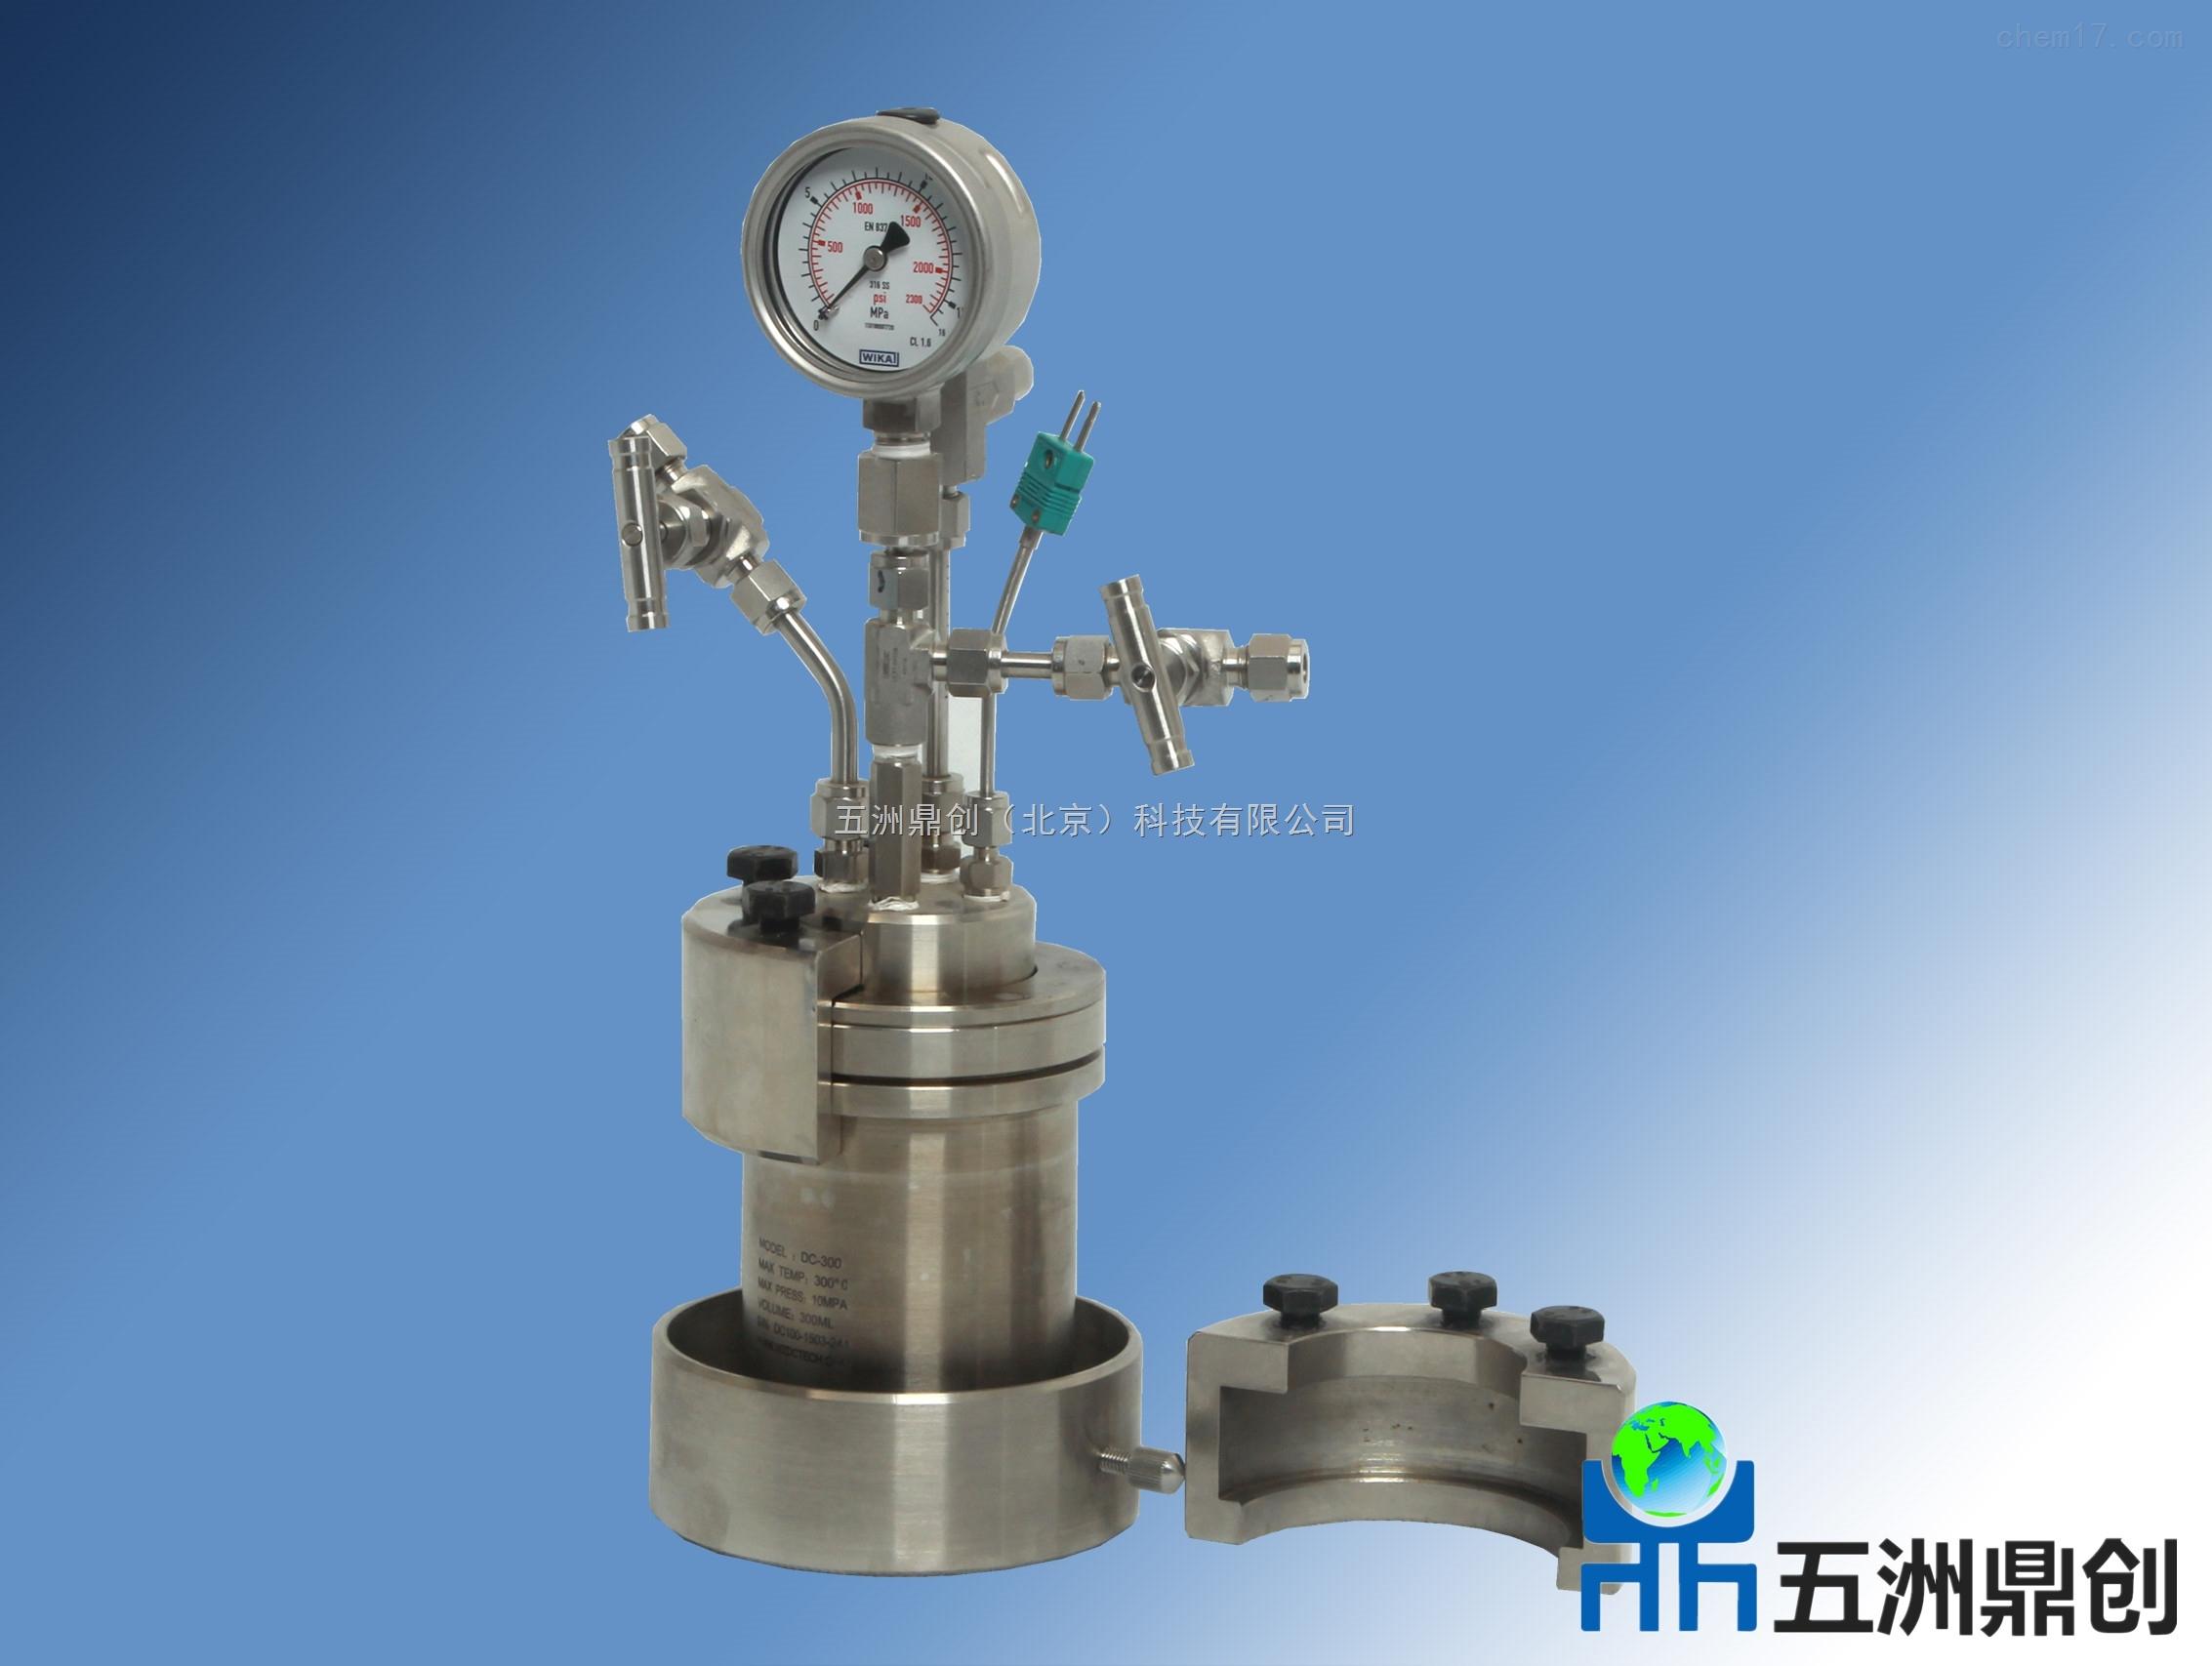 DC北京反应器实验室不锈钢简易高压反应釜